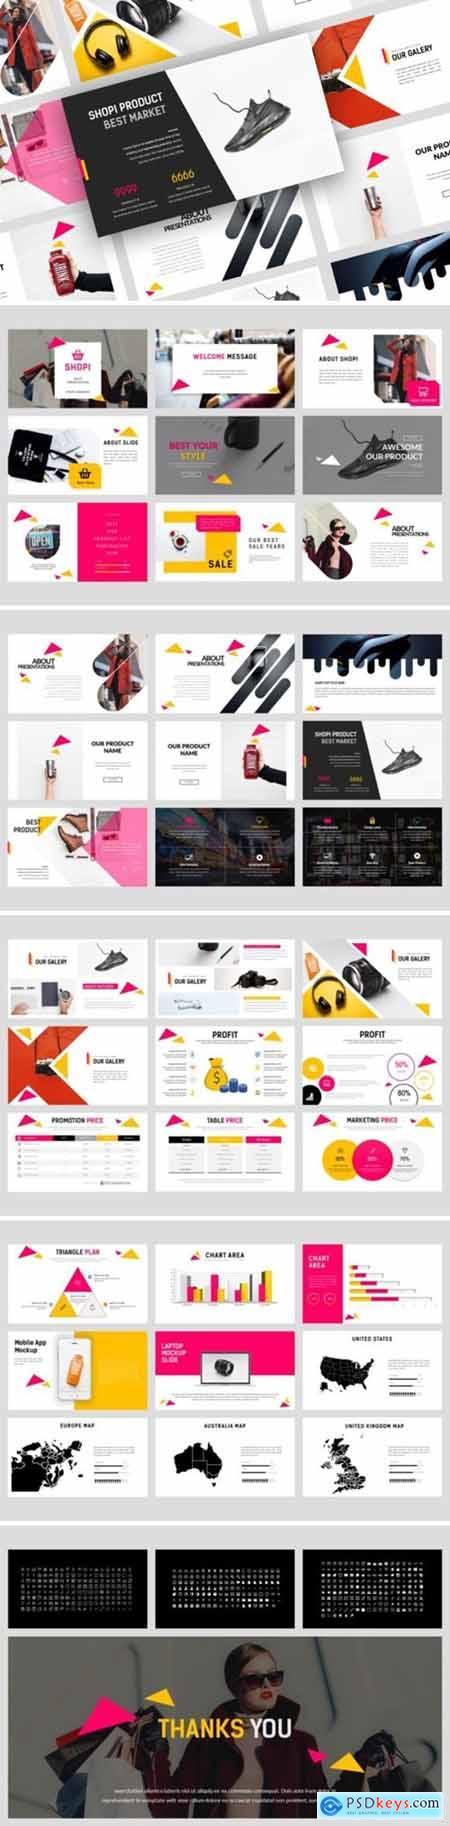 Shopi Market Powerpoint, Keynote and Google Slides Templates